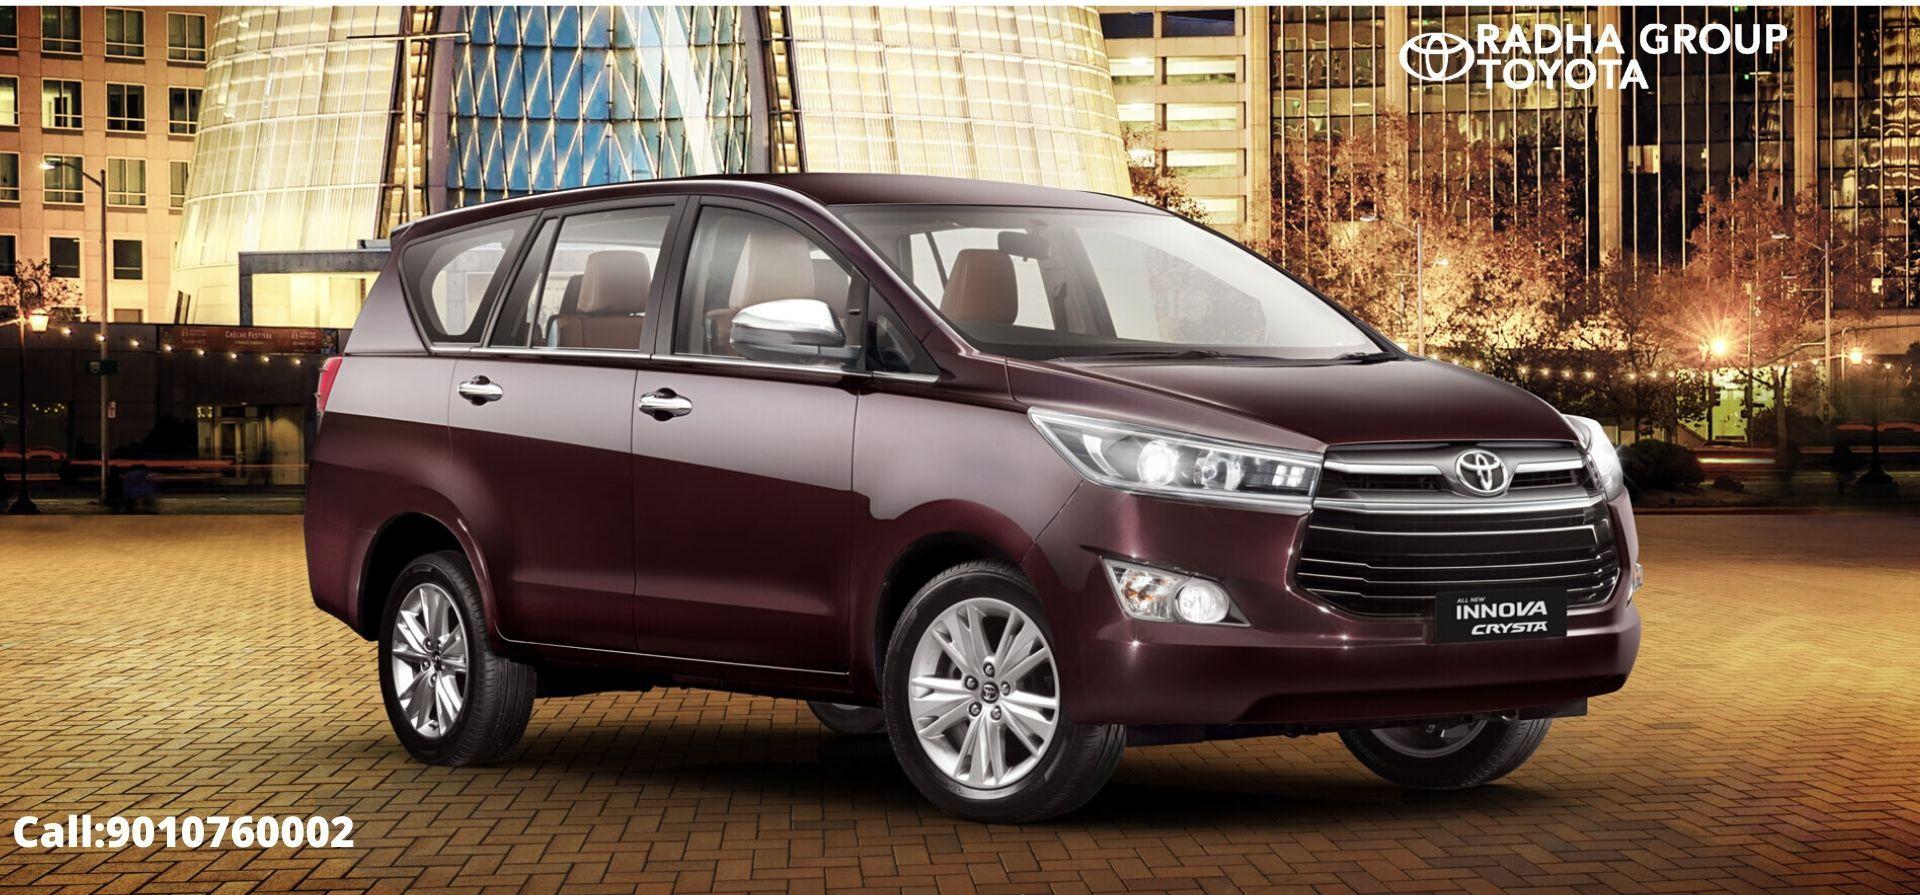 Toyota Innova Crysta Price In Hyderabad Vijayawada Features Mileage Colors Images In 2020 Toyota Innova Toyota